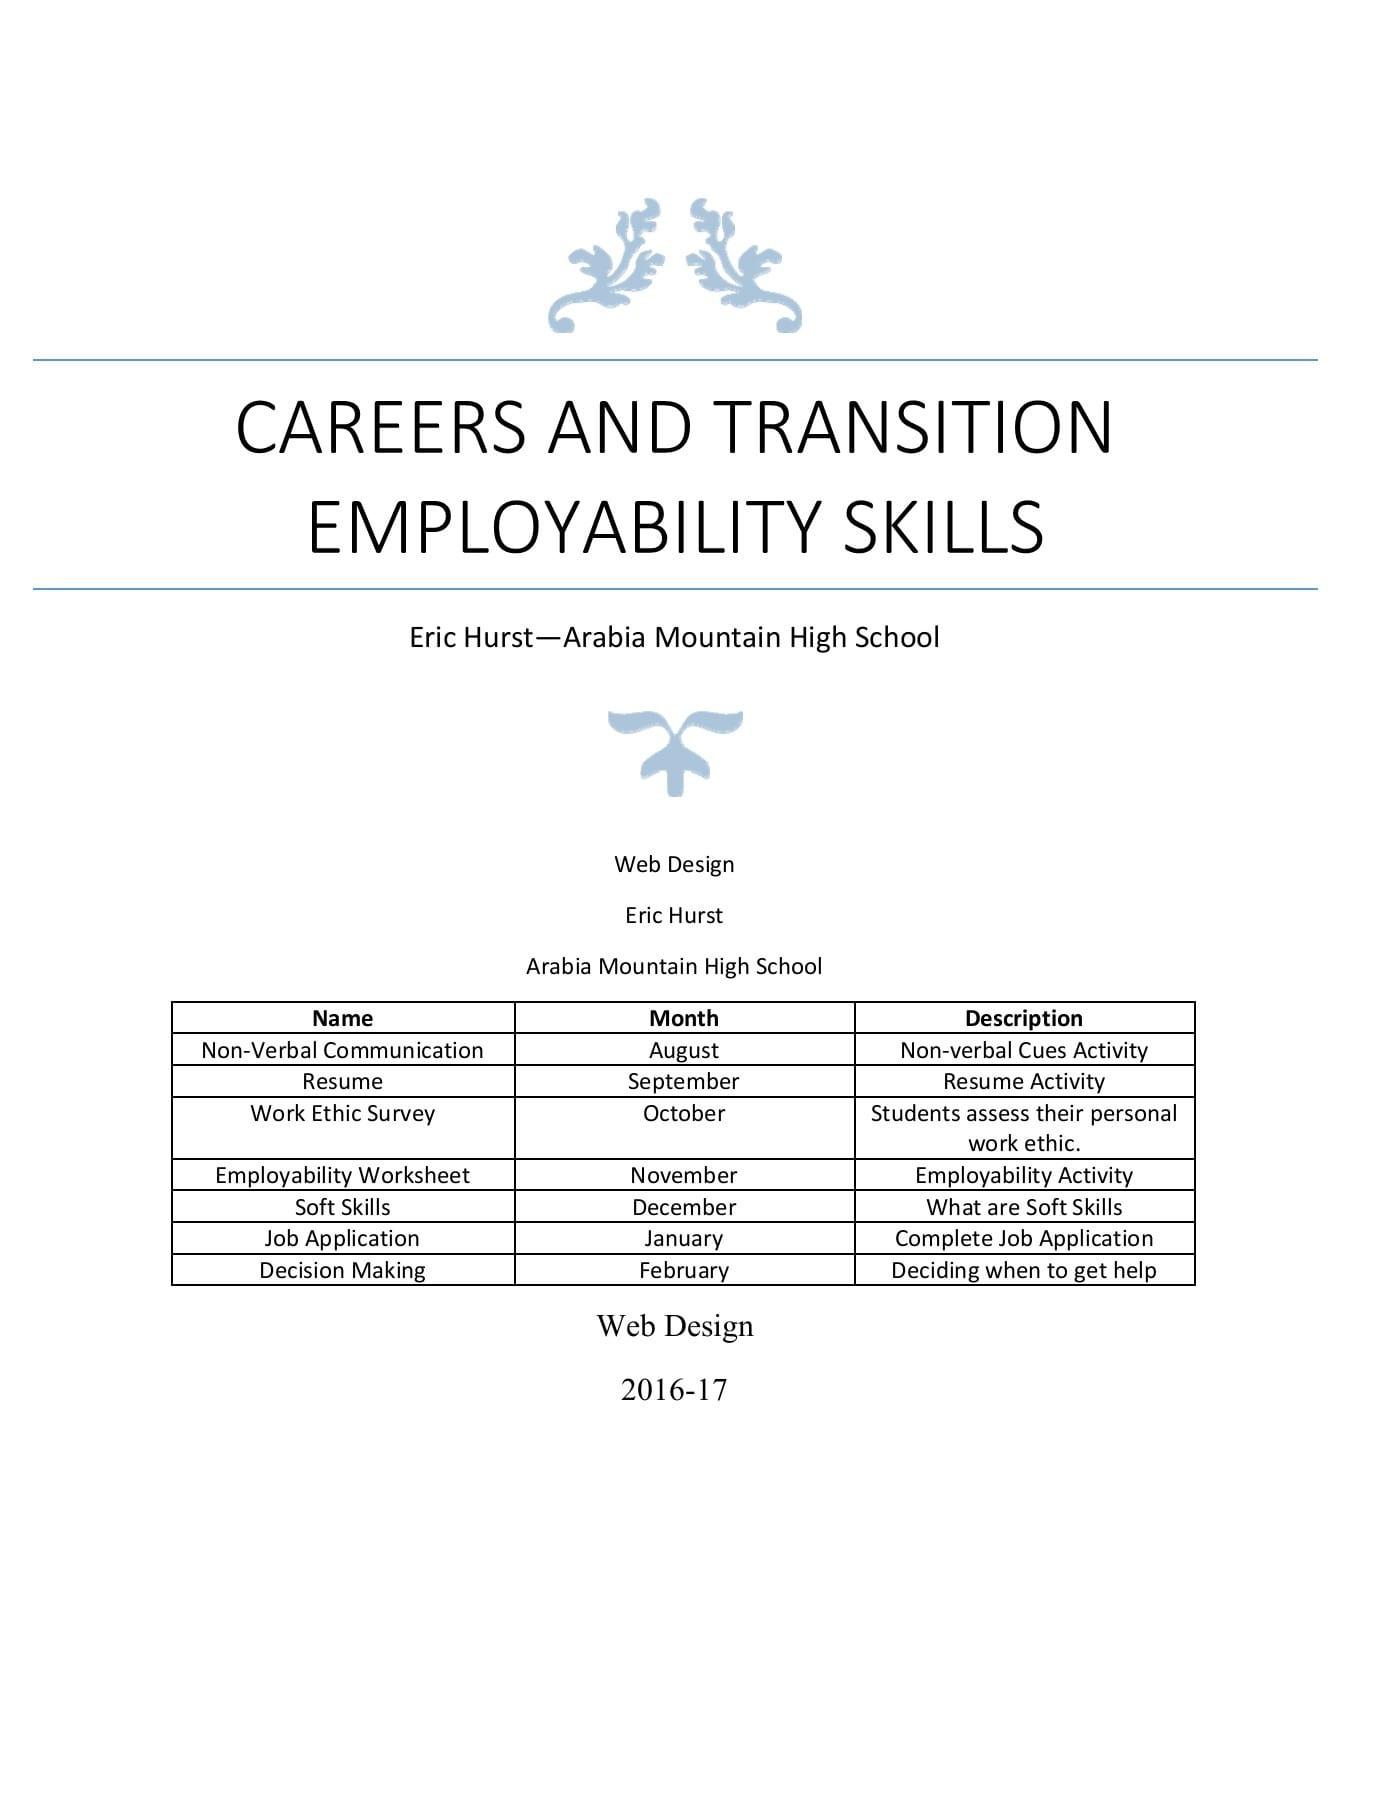 Employability Skills Web Design